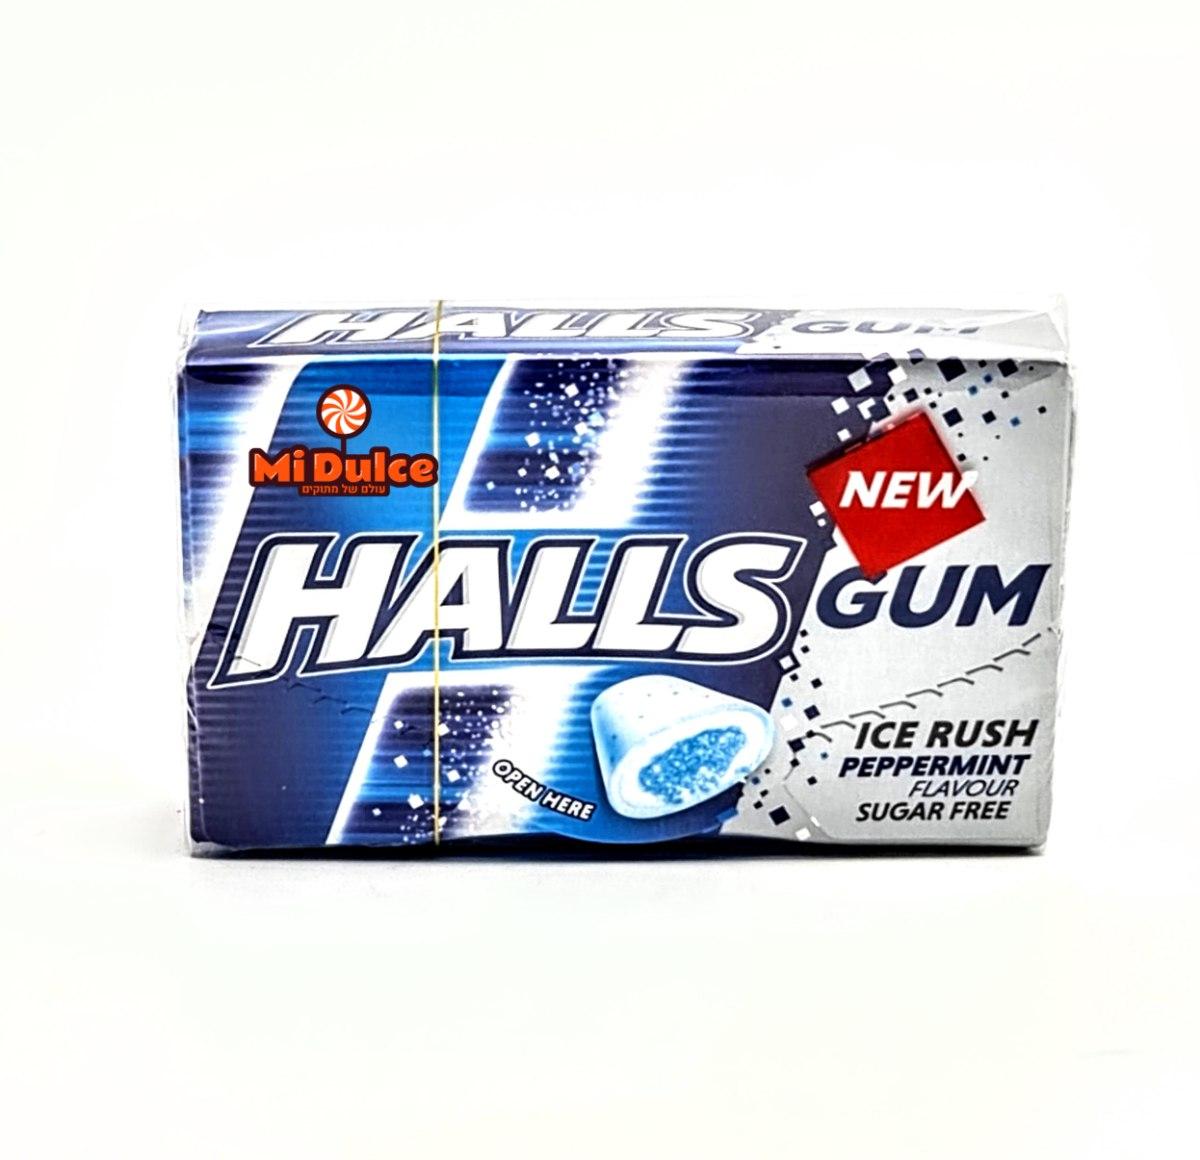 Halls Gum בטעם מנטה חריפה